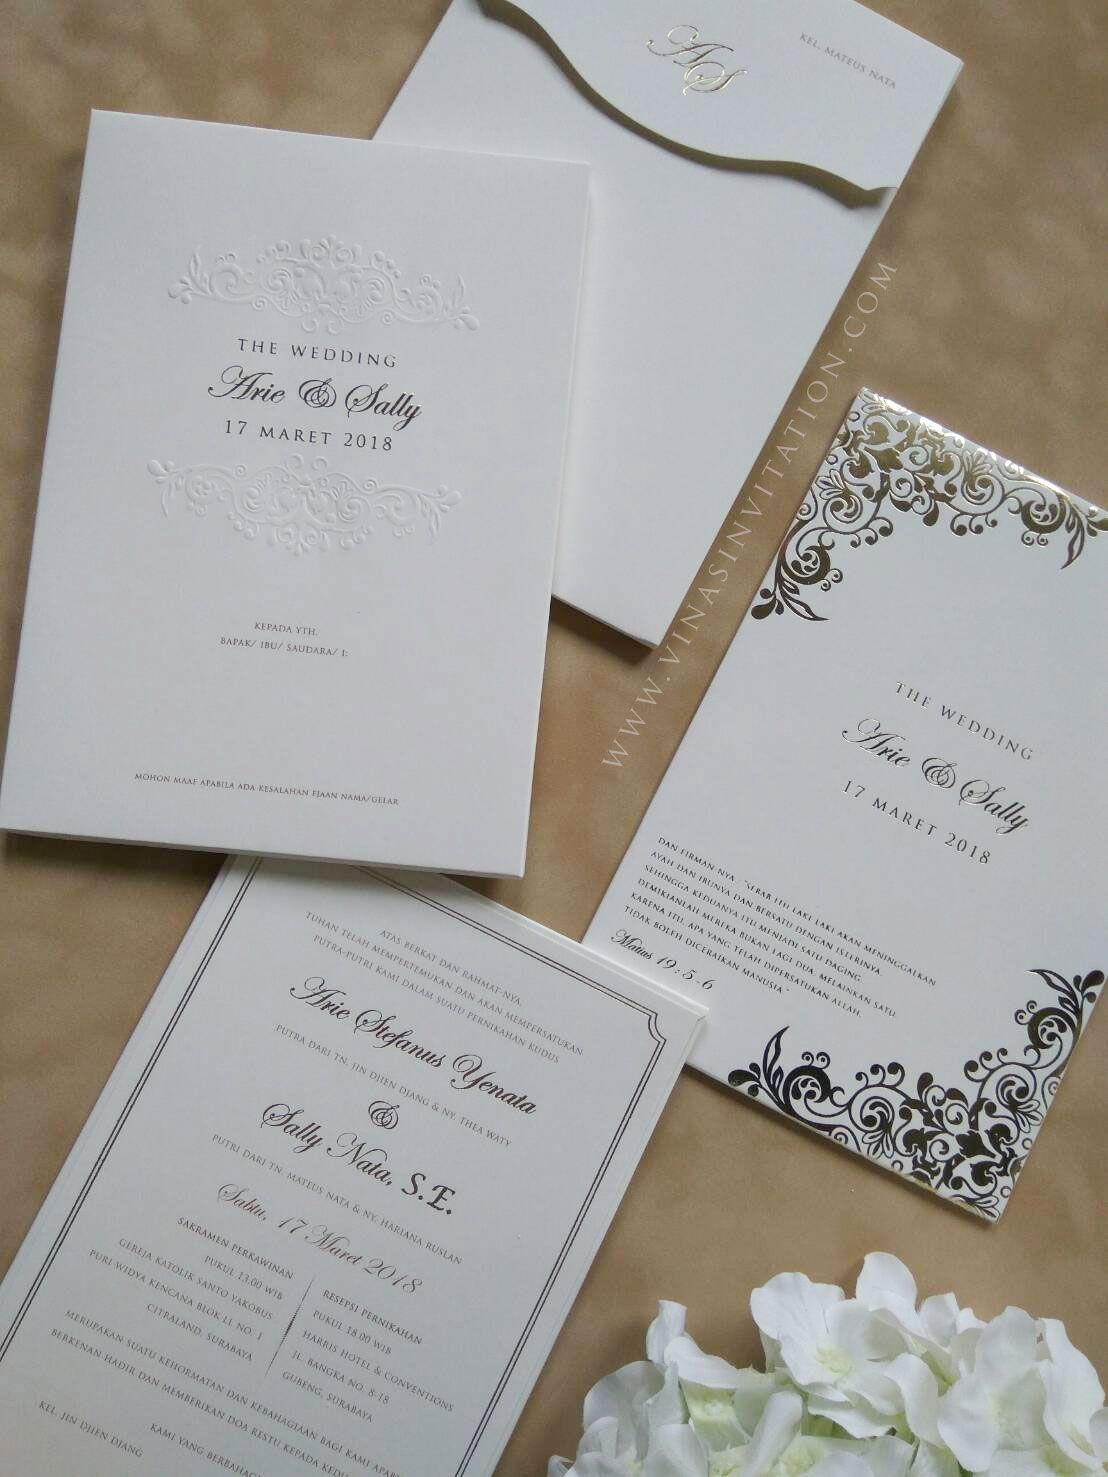 Vinas Invitation Sydney Wedding Invitation Indonesia Wedding Invitation Pure White Desain Undangan Perkawinan Contoh Undangan Pernikahan Undangan Pernikahan